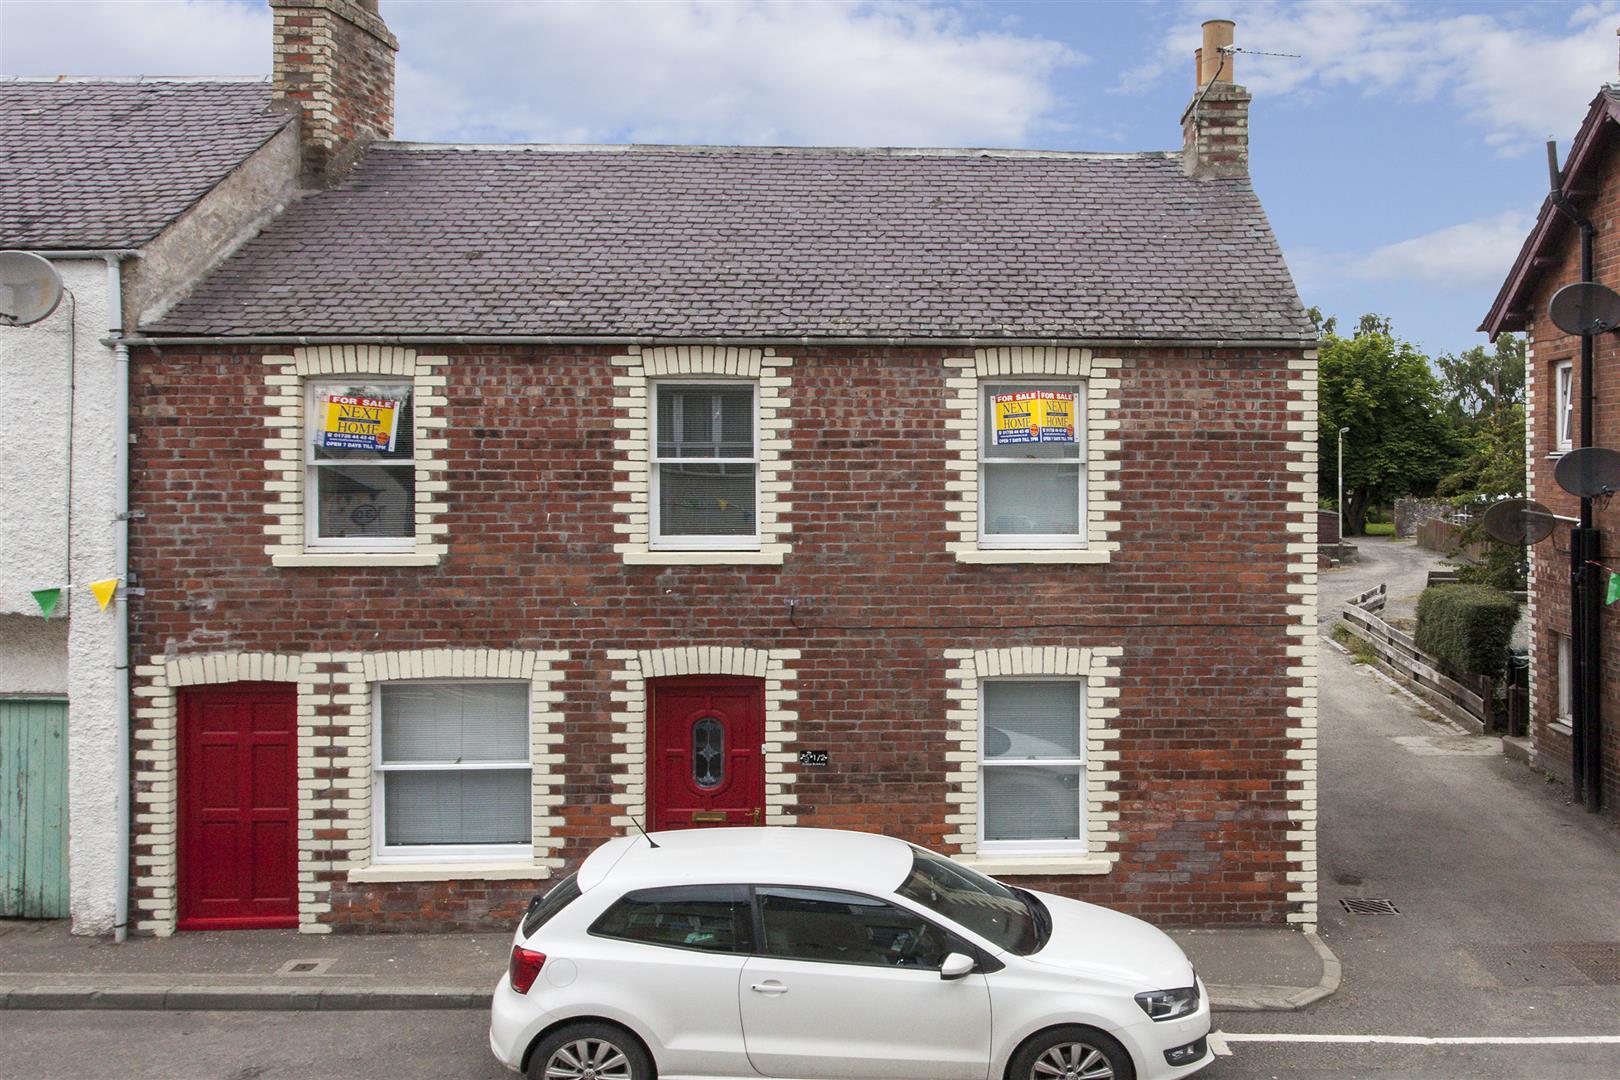 1 Sharps Buildings, High Street, Errol, Perthshire, PH2 7QP, UK